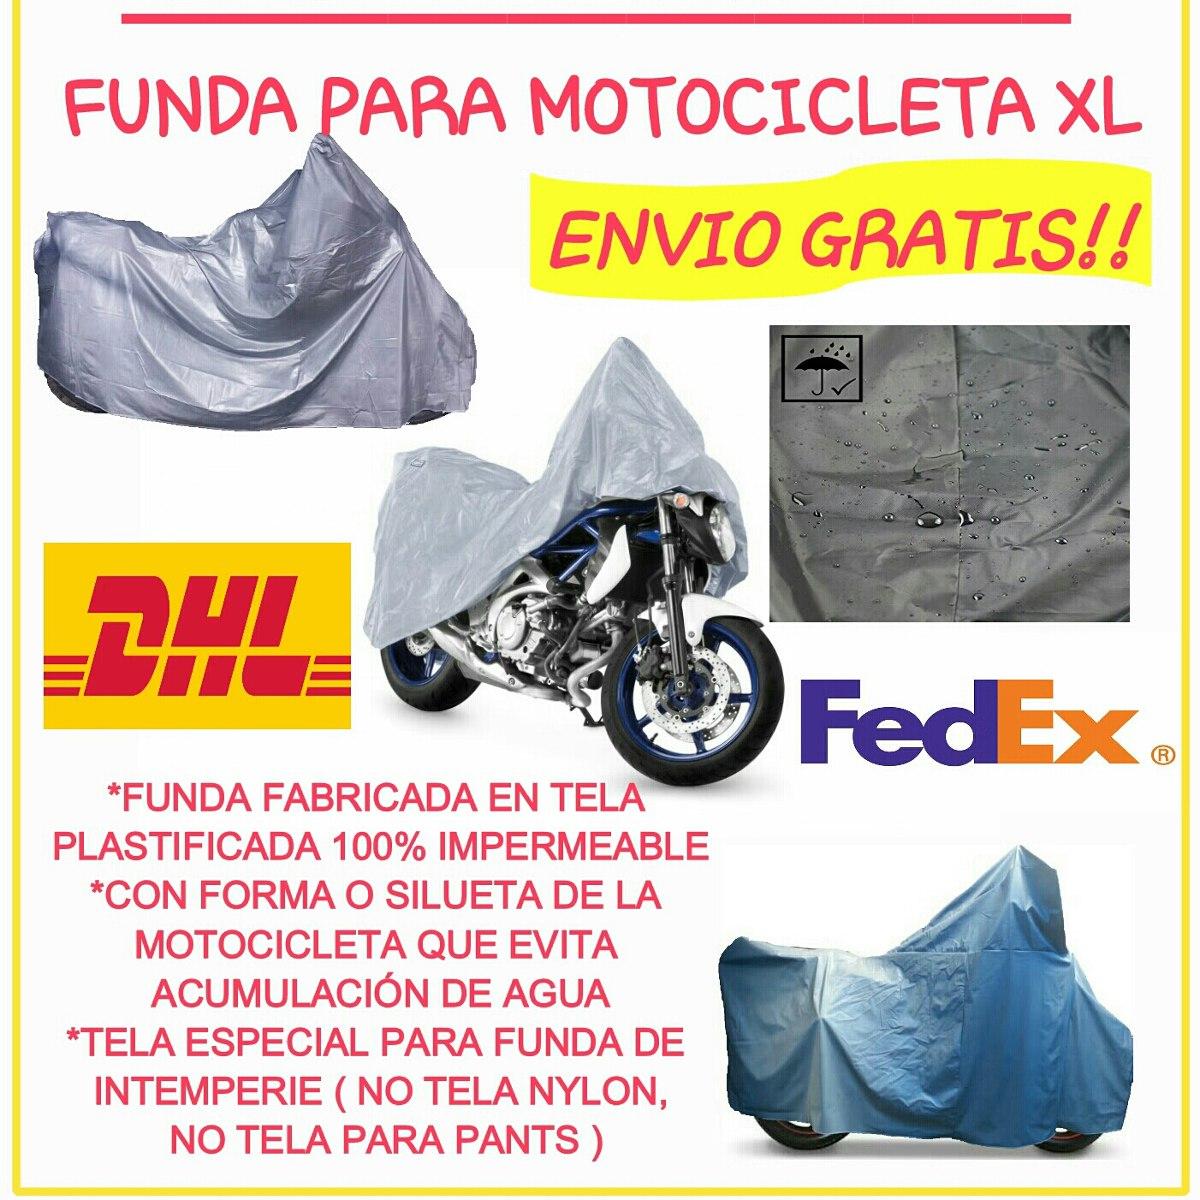 f15da5d9ea6 Funda Xxl Para Moto Choper Con Alforjas Parabrisas Etc. - $ 499.00 ...